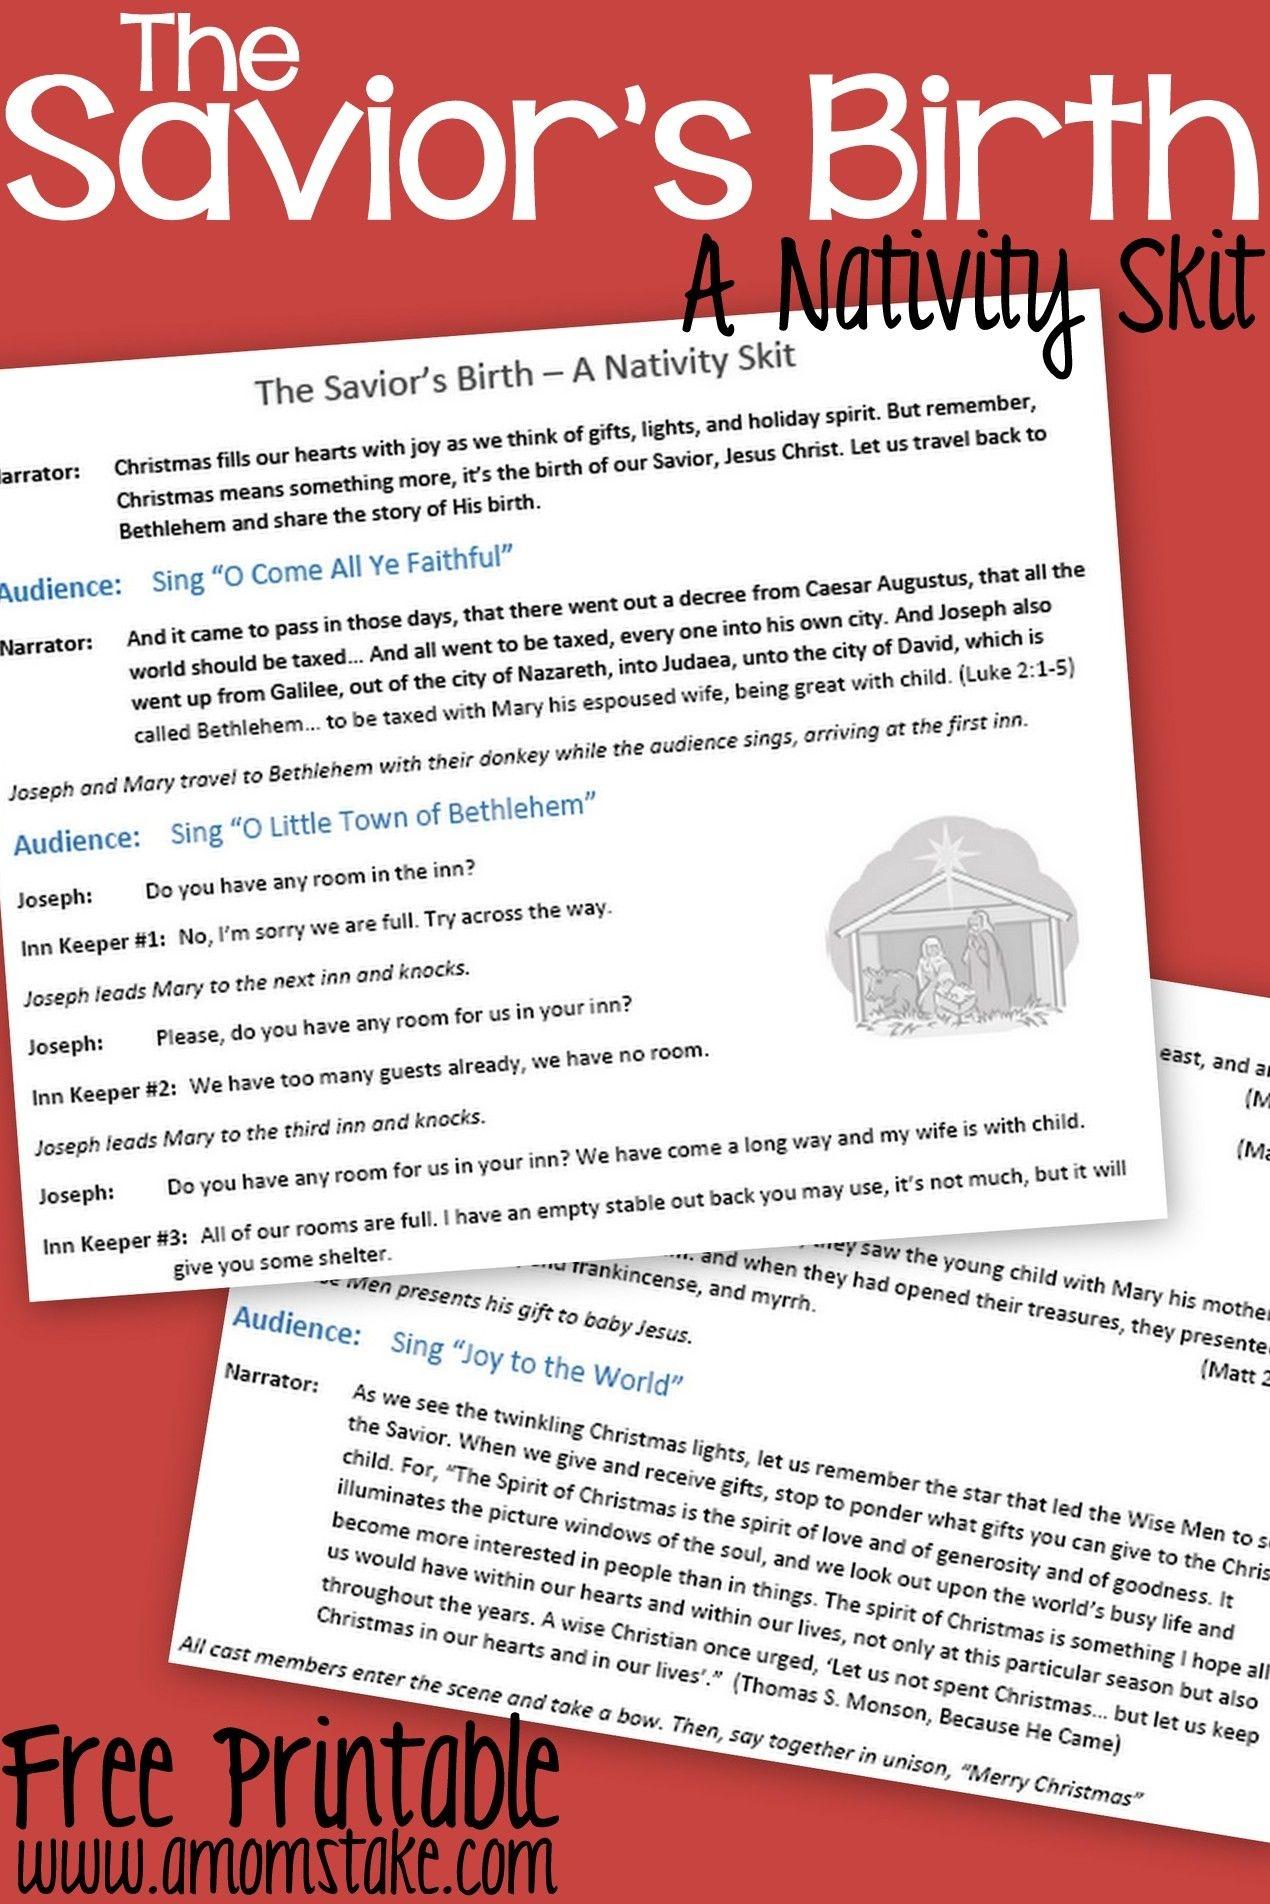 Free Printable Nativity Skit To Act Out The Birth Of The Savior - Free Printable Christmas Plays Church